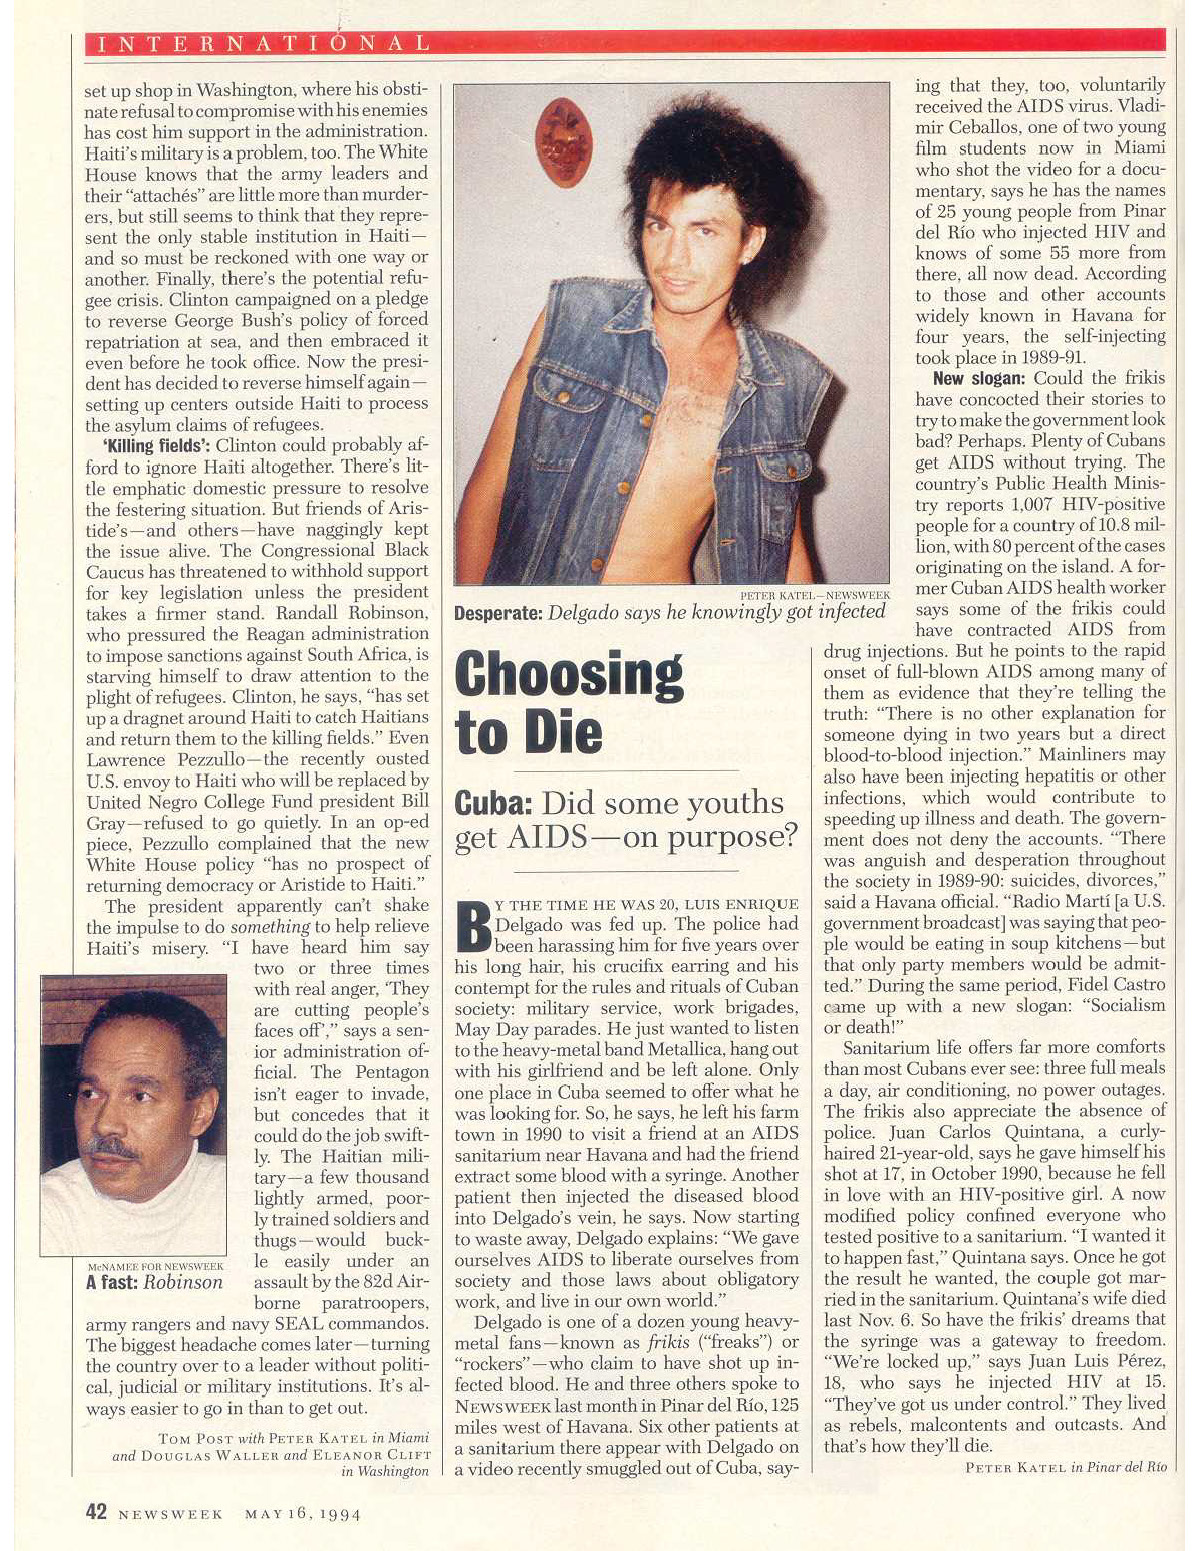 Peter Katel in Pinar Del Rio, Cuba – NEWSWEEK Magazine (1994)